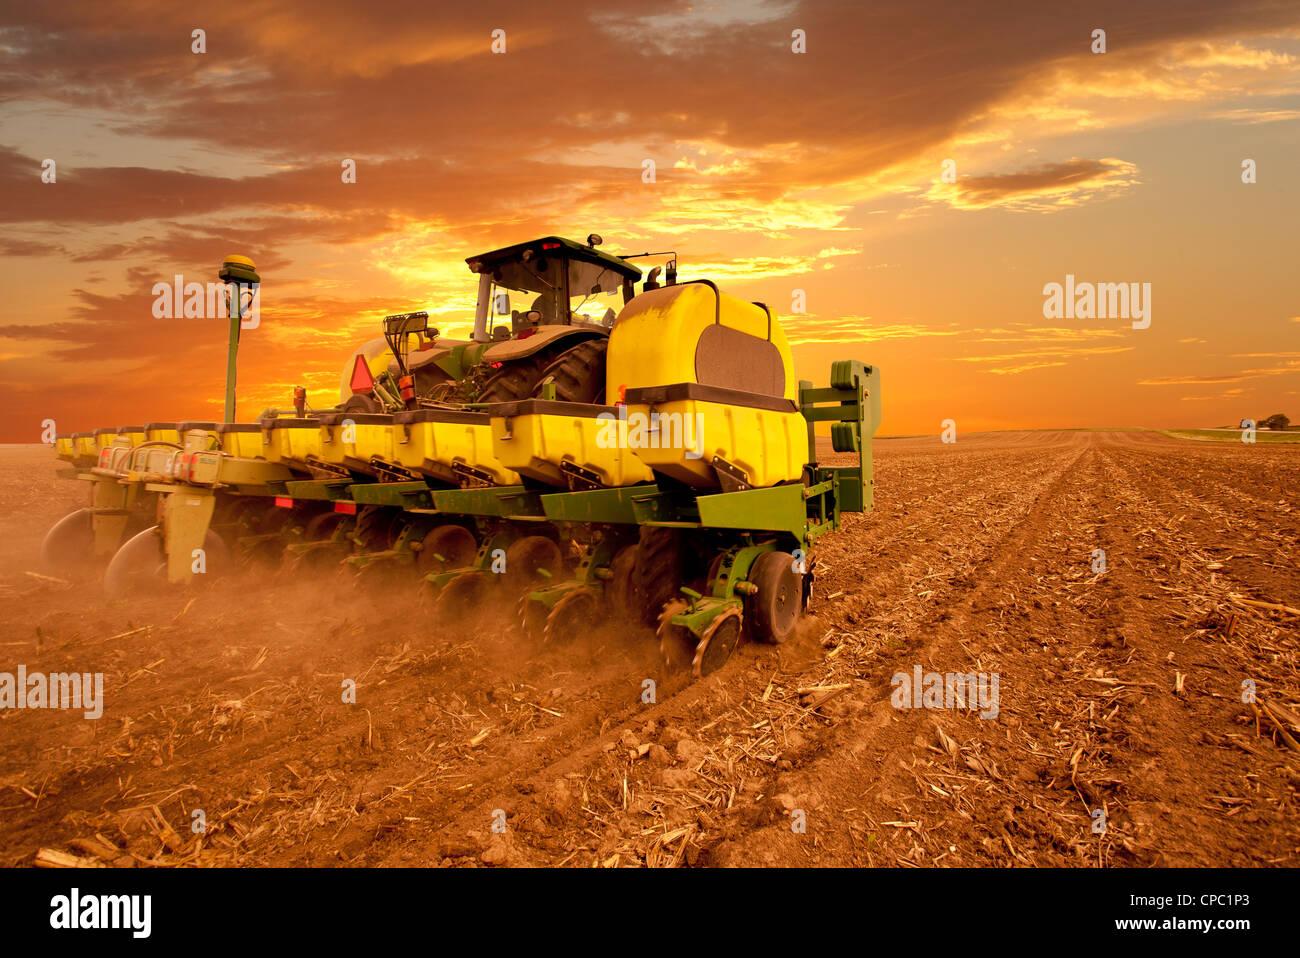 Planting Corn - Stock Image